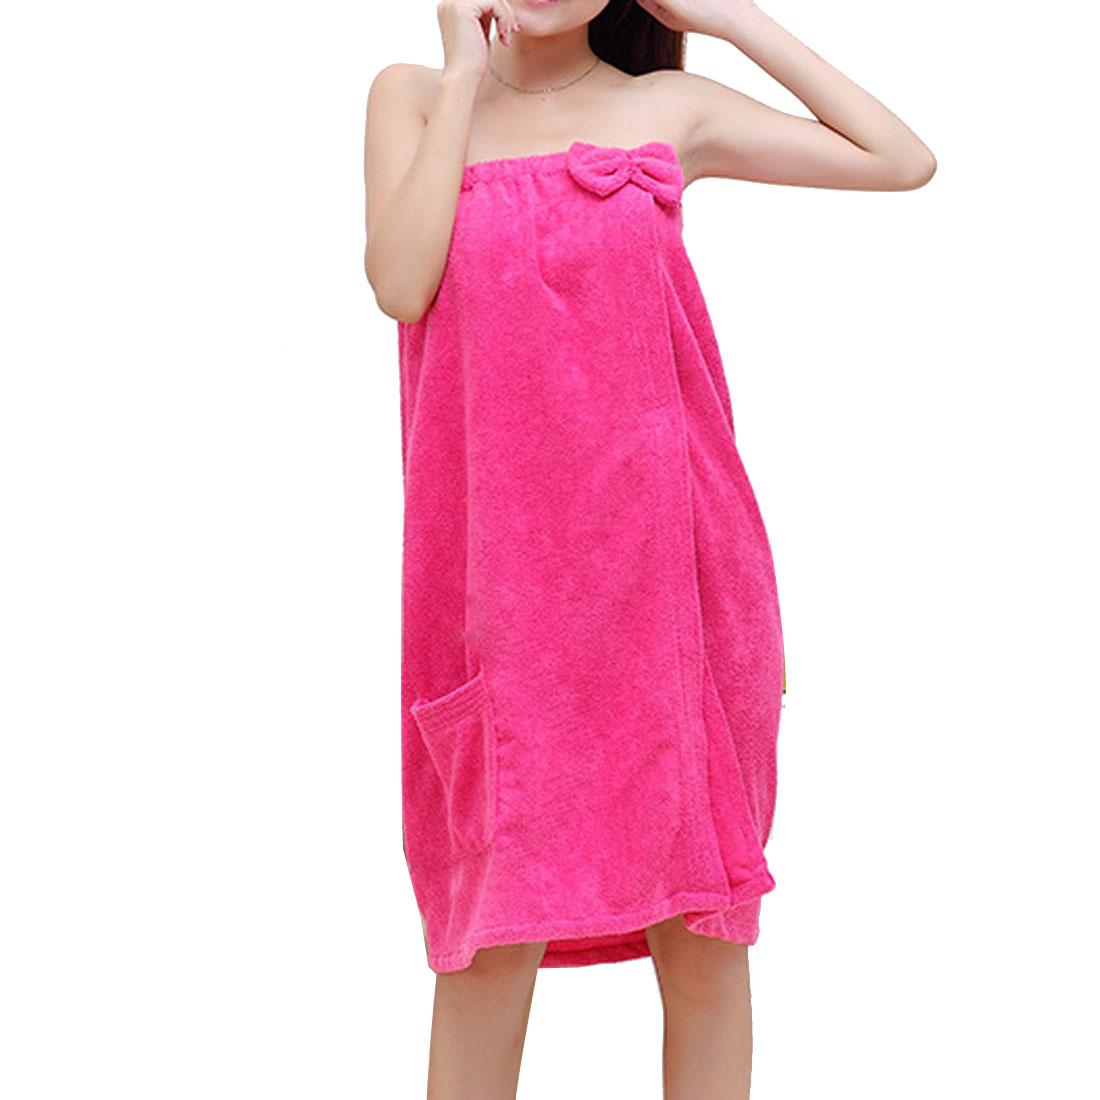 Lady Microfiber Elastic Bowknot Beach Swimming Shower Bath Towel Wrap Skirt Washcloth Fuchsia